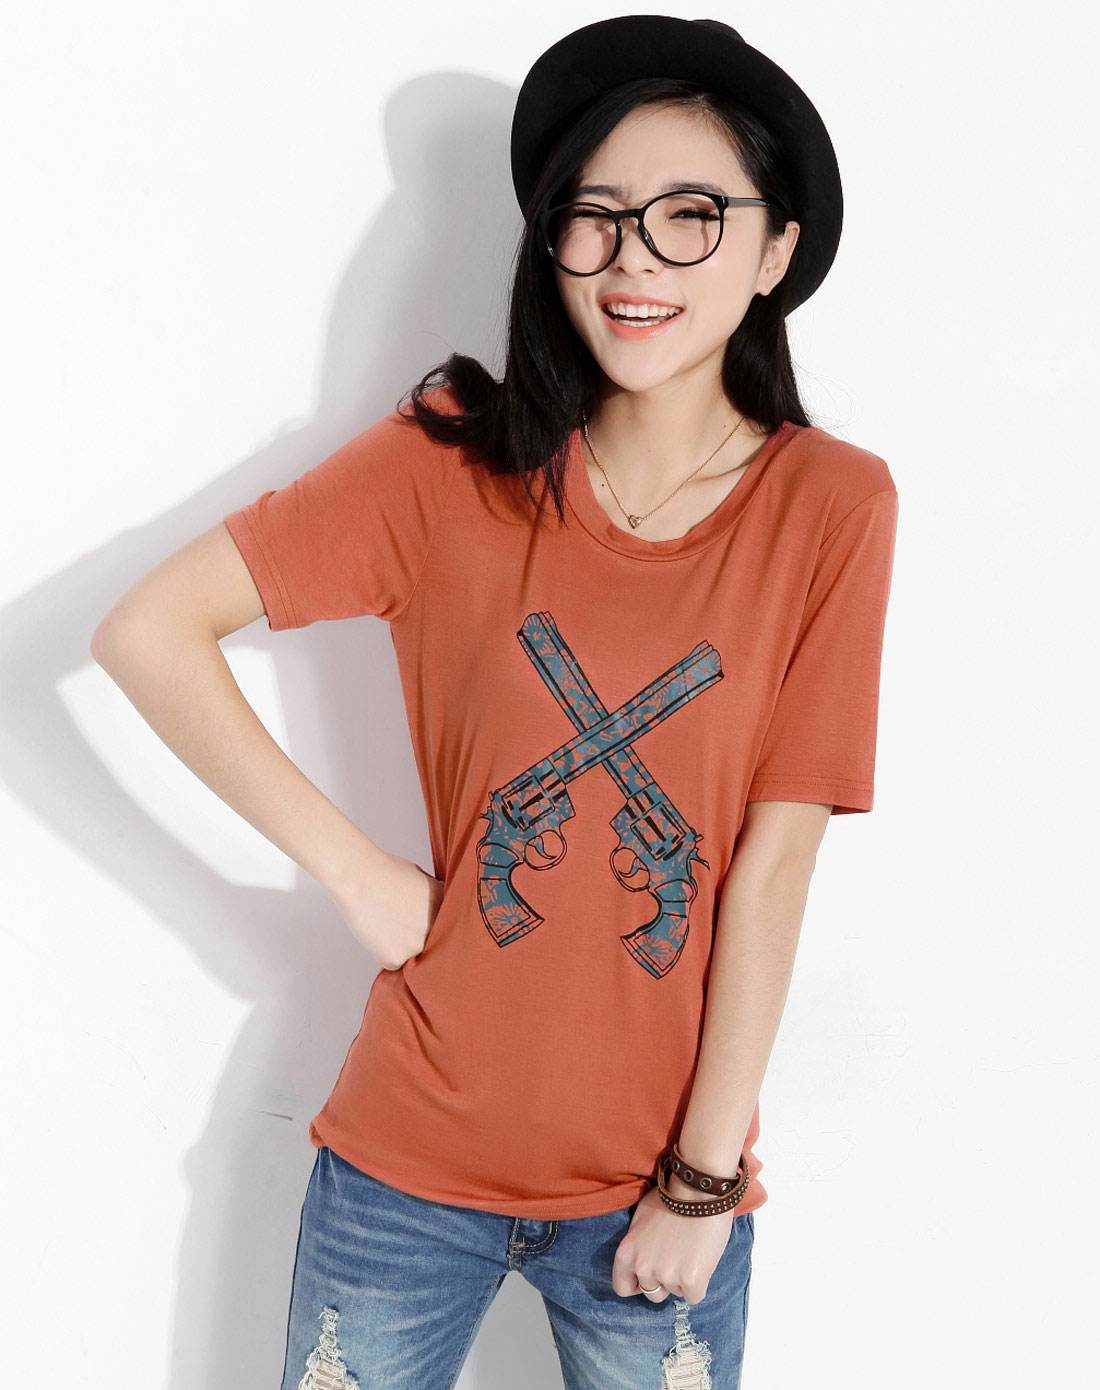 T Shirt Women Ladies Top Tee Shirt Summer khaki Clothing